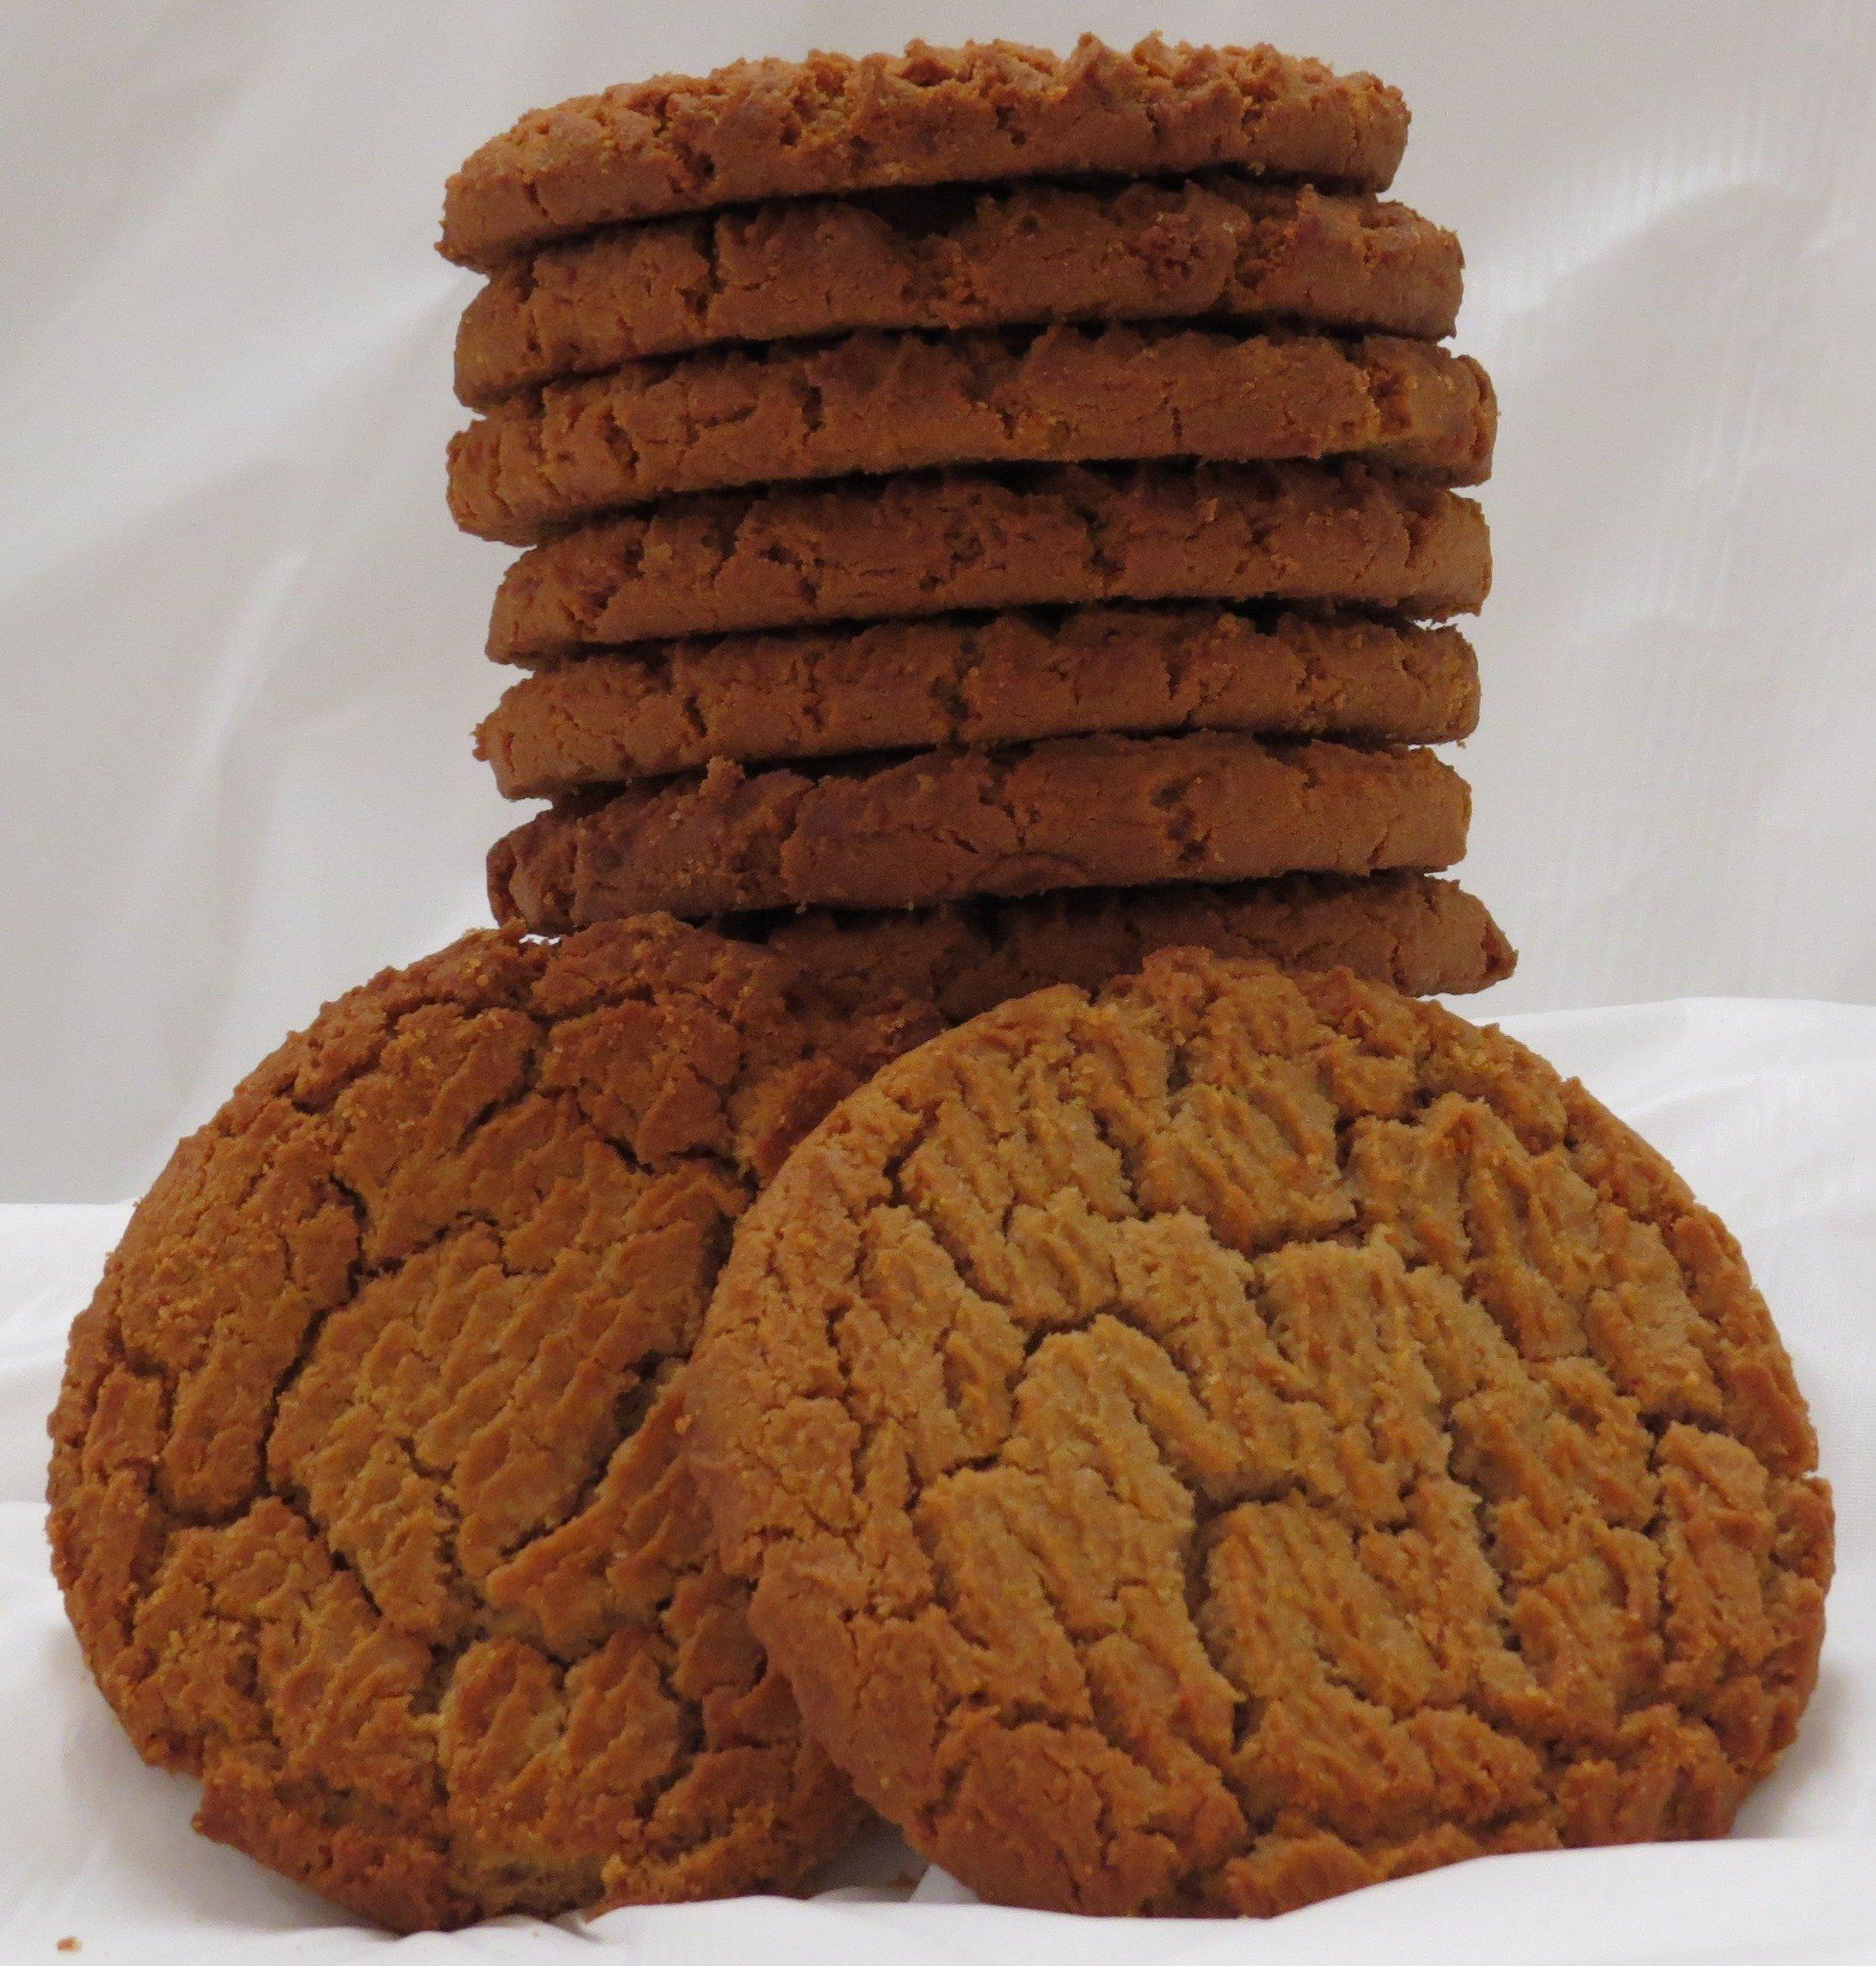 Homemade Peanut Butter Cookies - 1 Dozen by Bread Box Bakery & Café - Shipshewana, Indiana